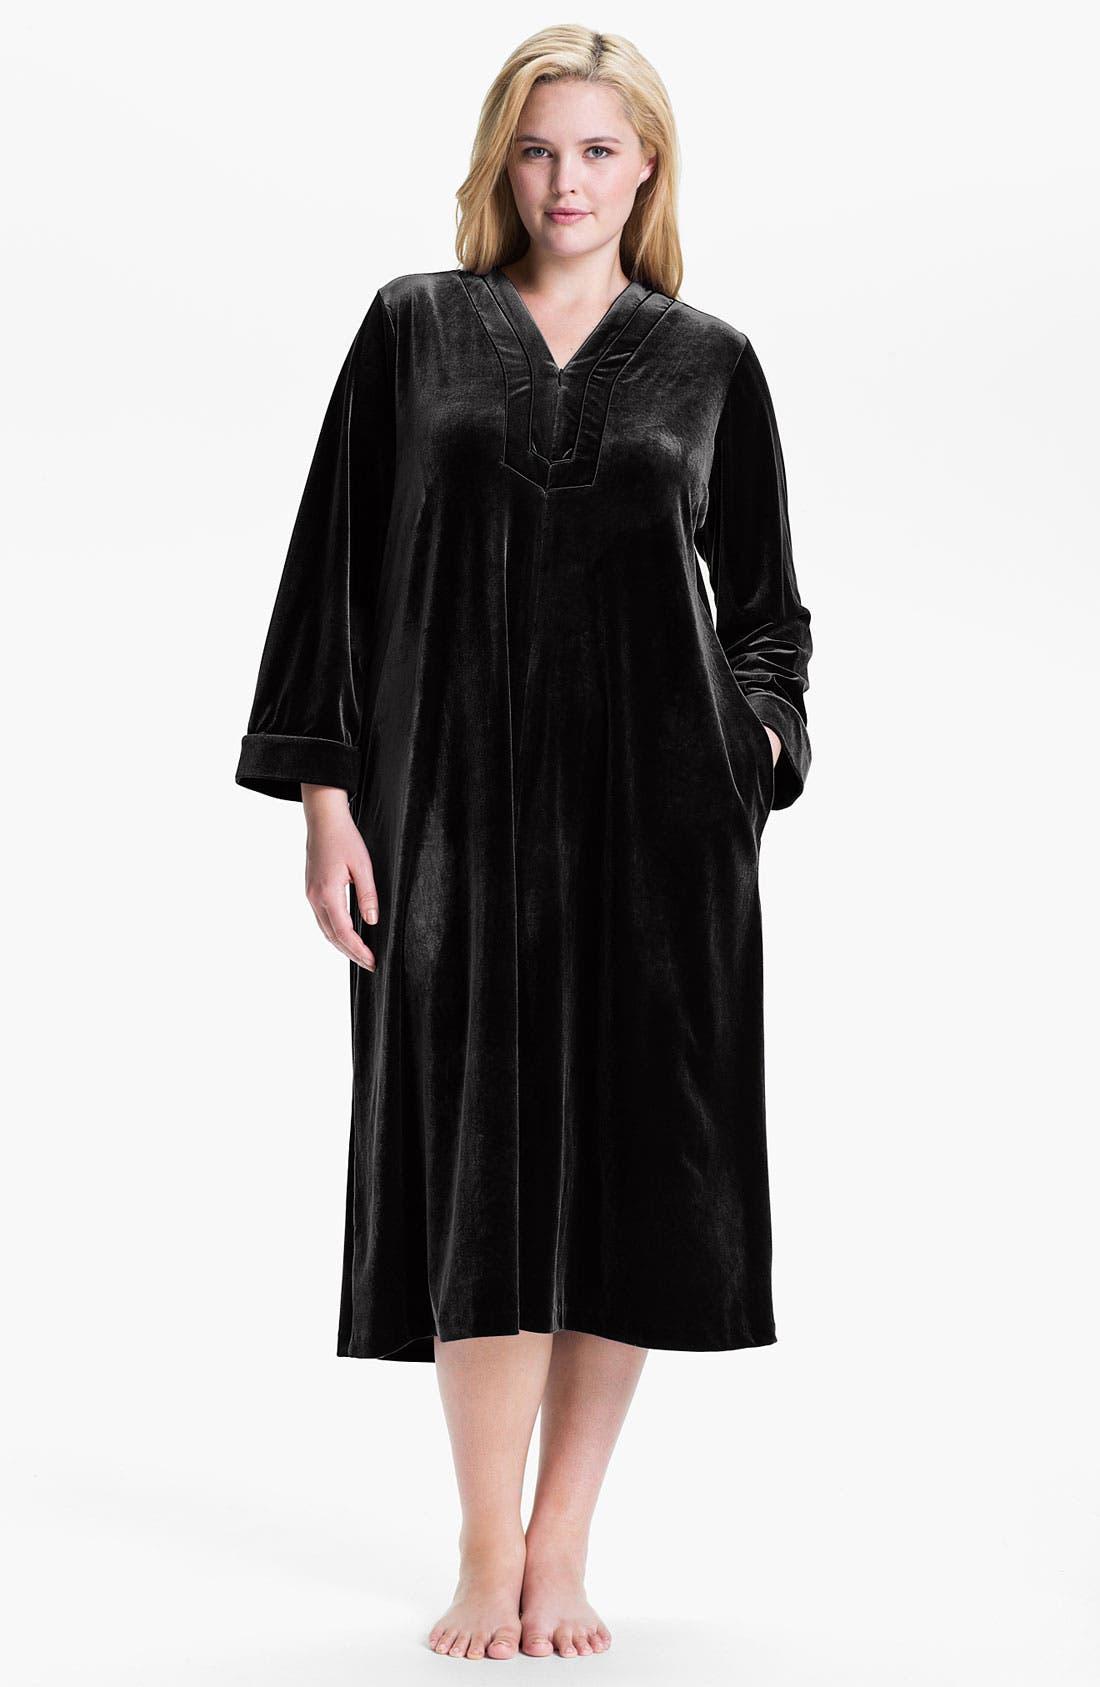 Main Image - Oscar de la Renta Sleepwear 'Zahara Nights' Robe (Plus)